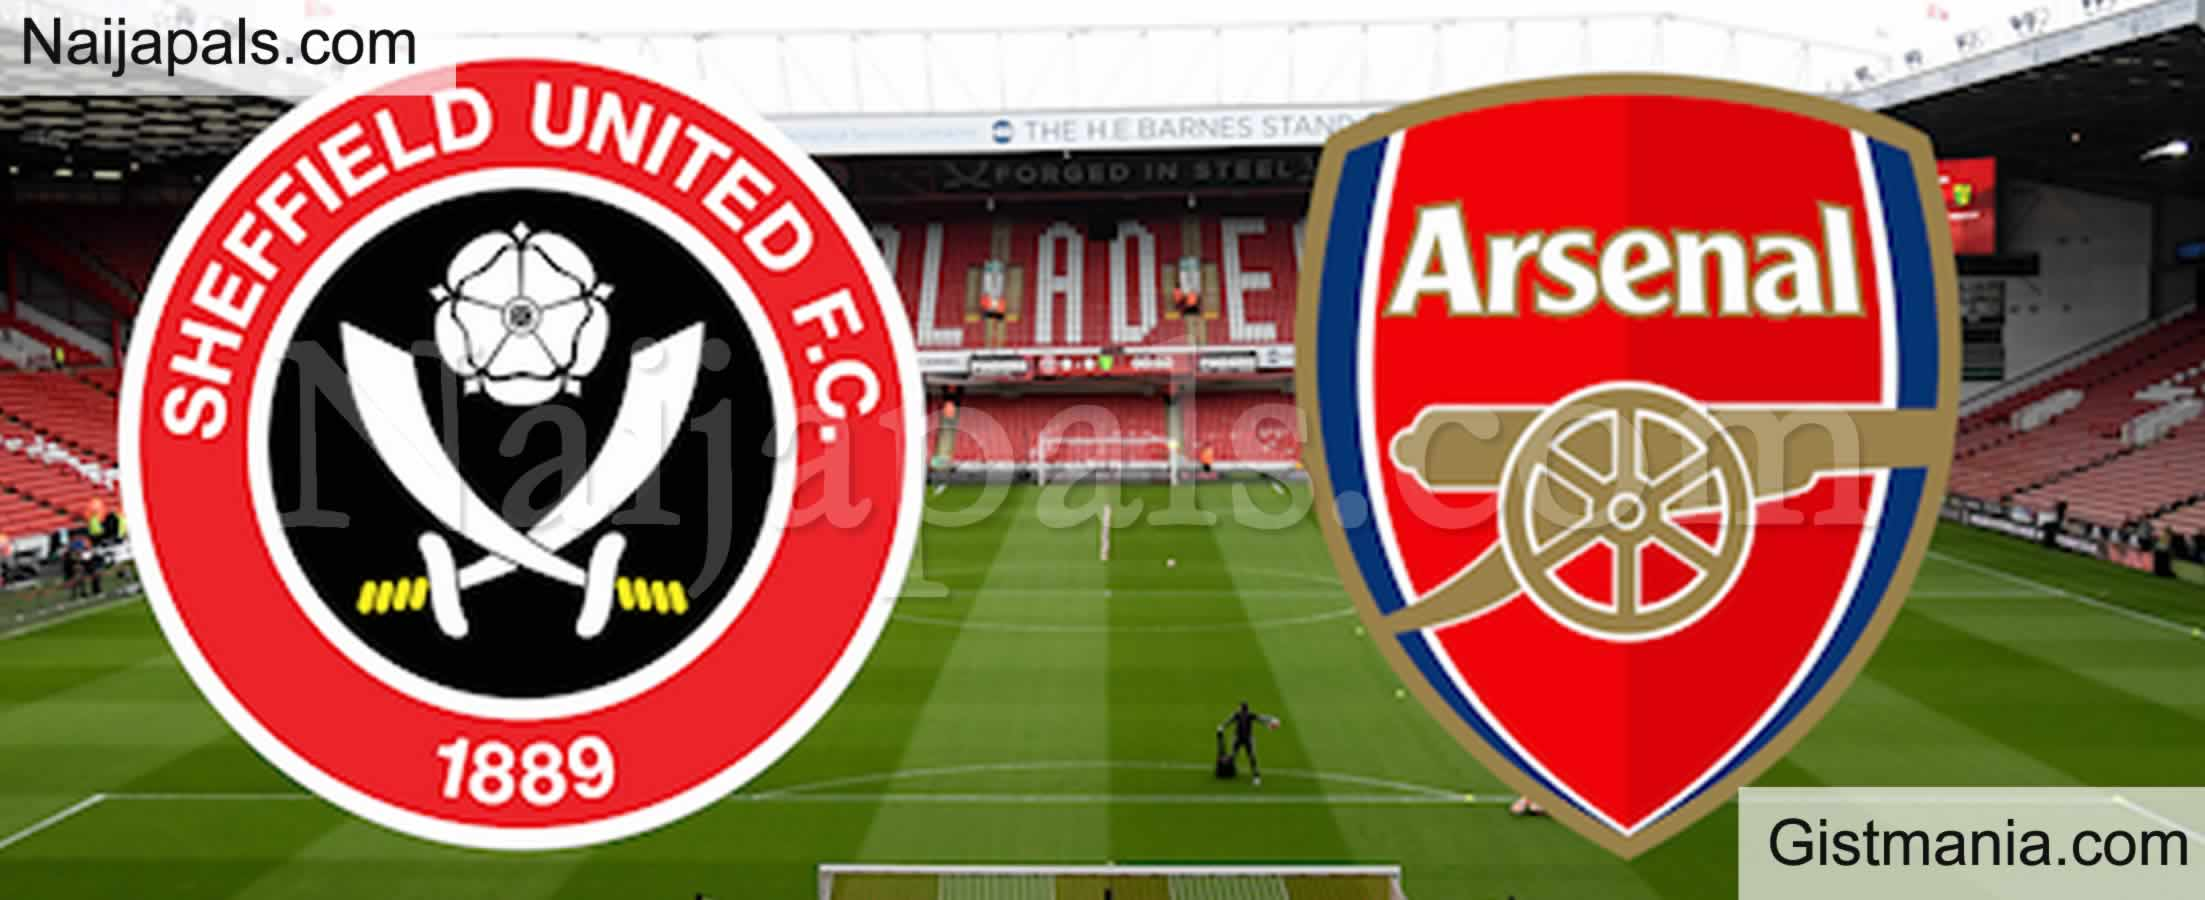 <img alt='.' class='lazyload' data-src='https://img.gistmania.com/emot/soccer.gif' /> <b>Sheffield United v Arsenal : English Premier League Match, Team News, Goal Scorers and Stats</b>